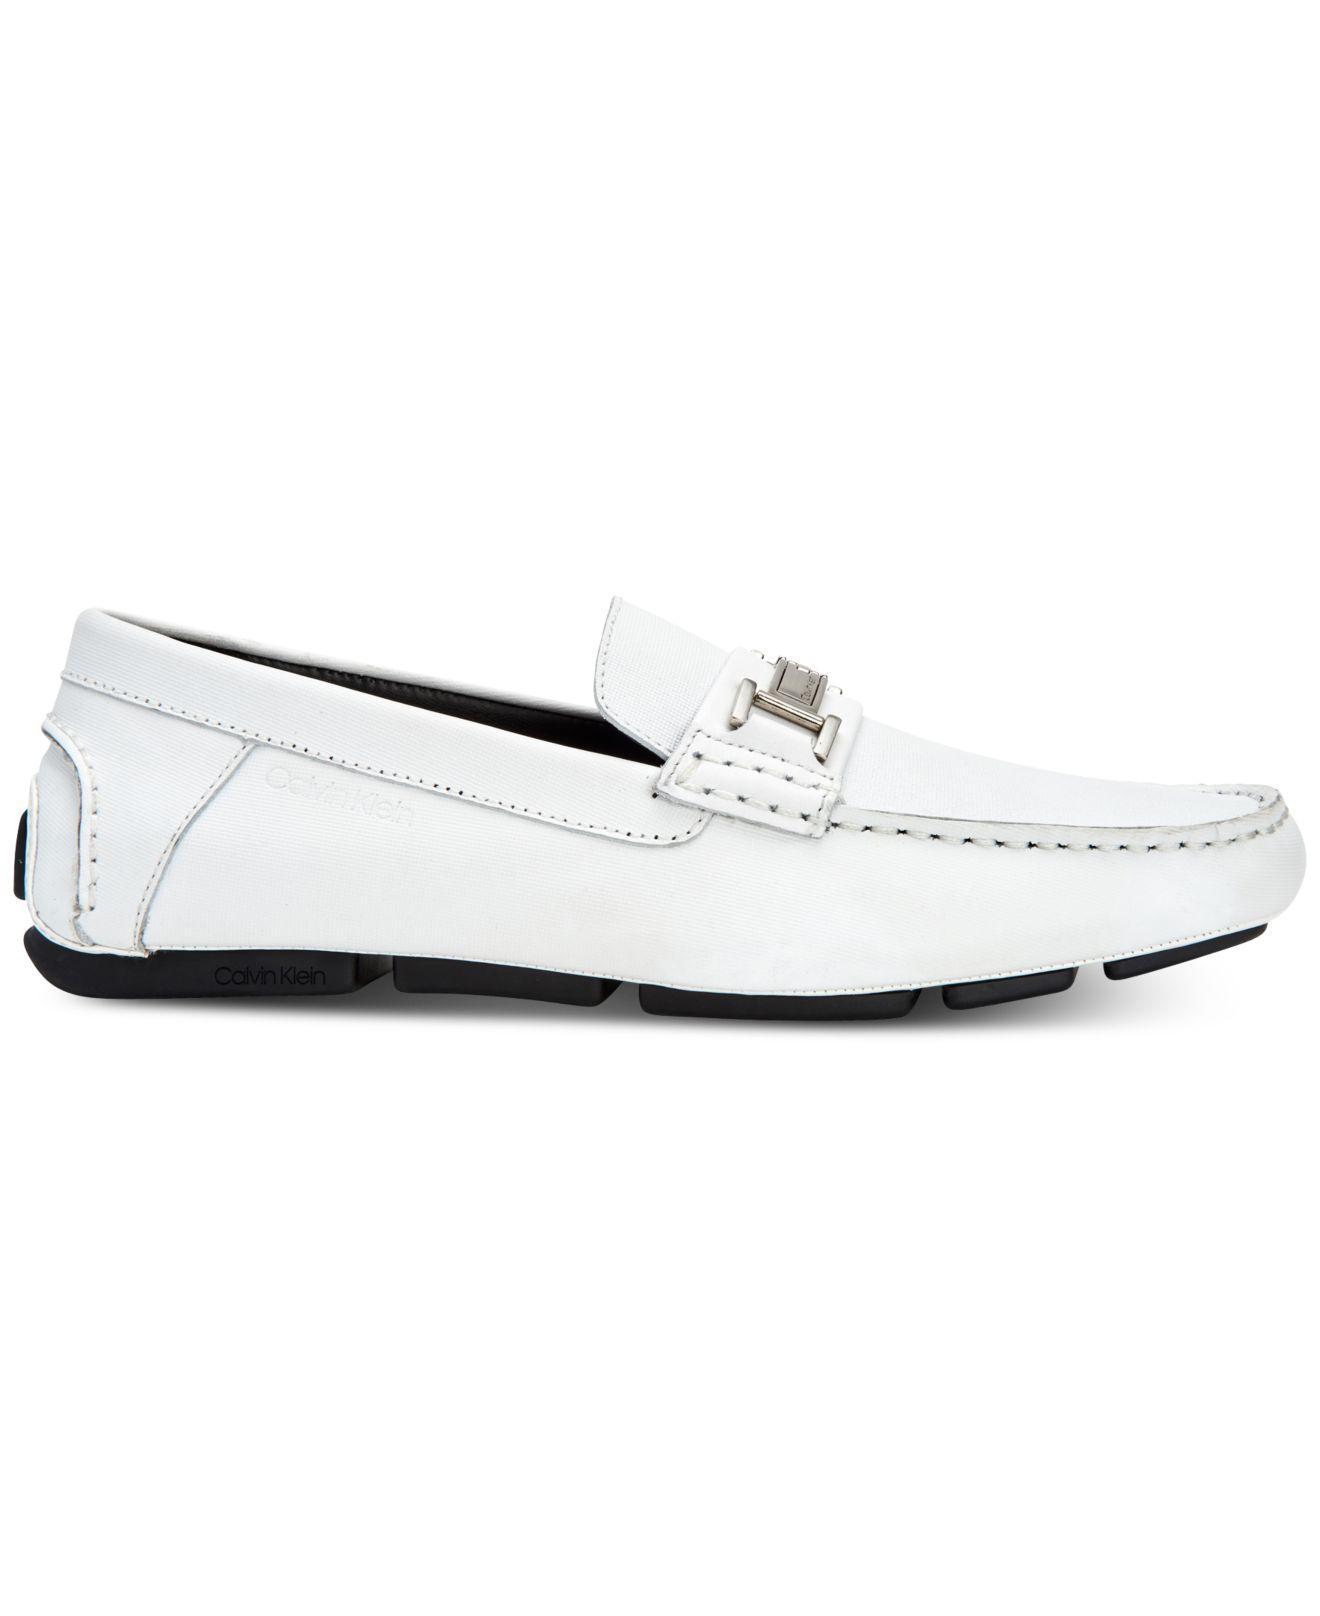 61e94646444 Lyst - Calvin Klein Magnus Loafers in White